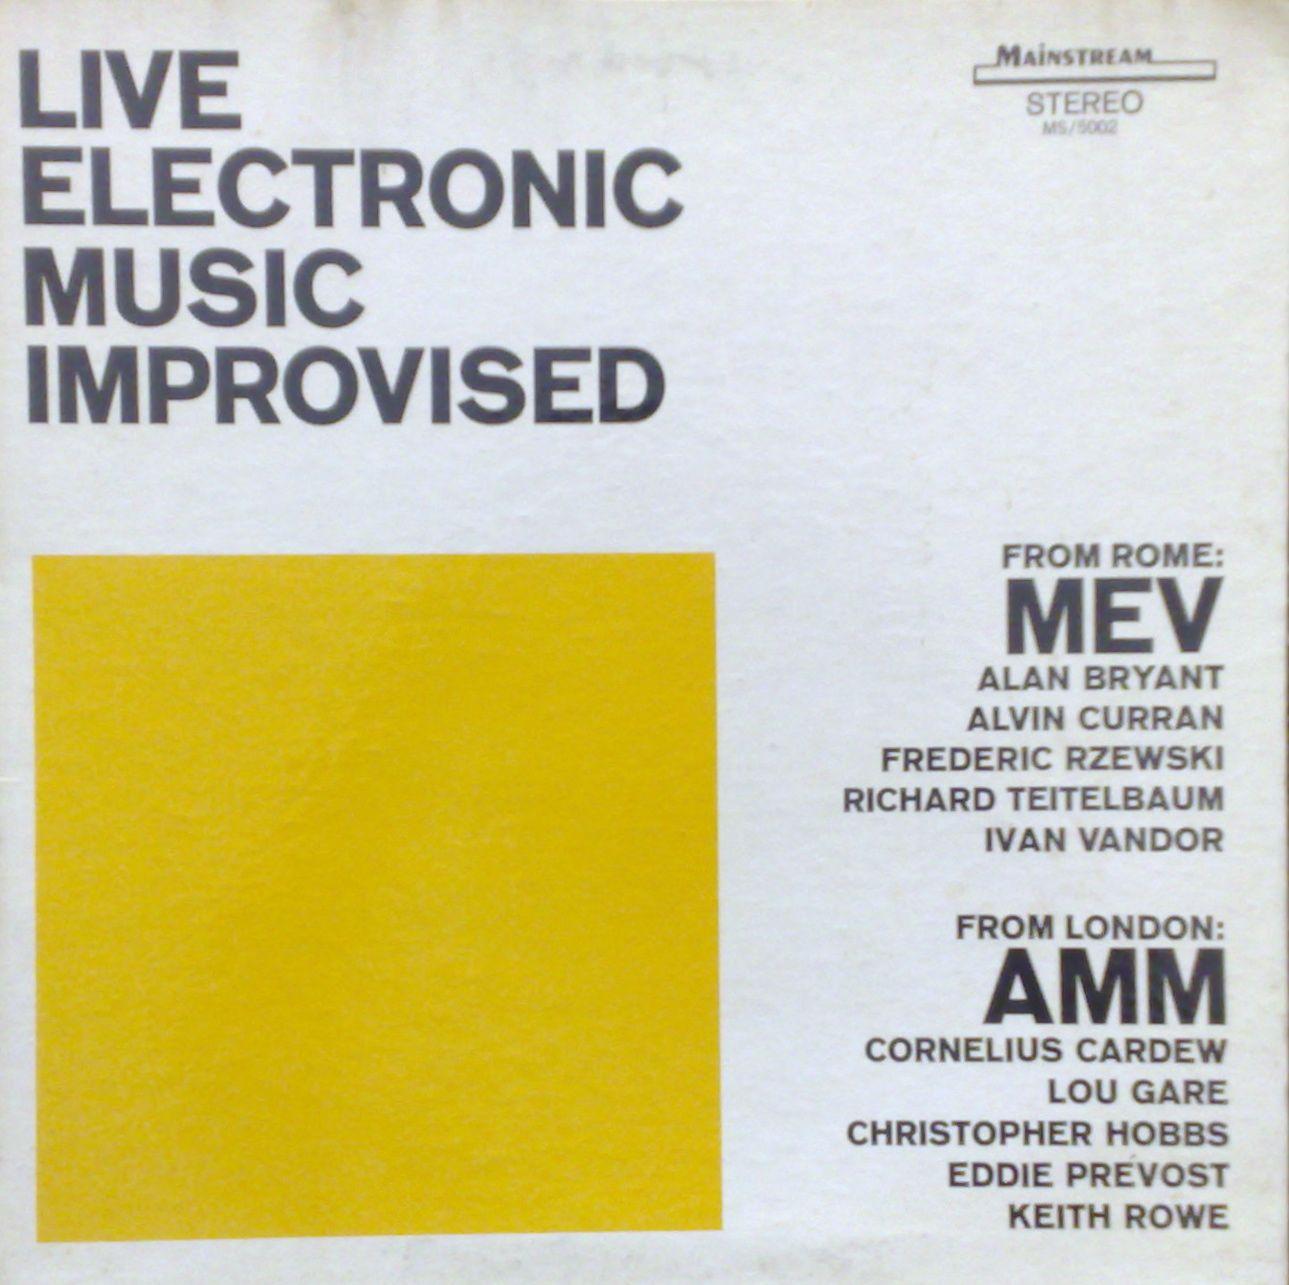 http://www.alvincurran.com/CD+LP_covers/mevamm%20LP%20cover.jpg